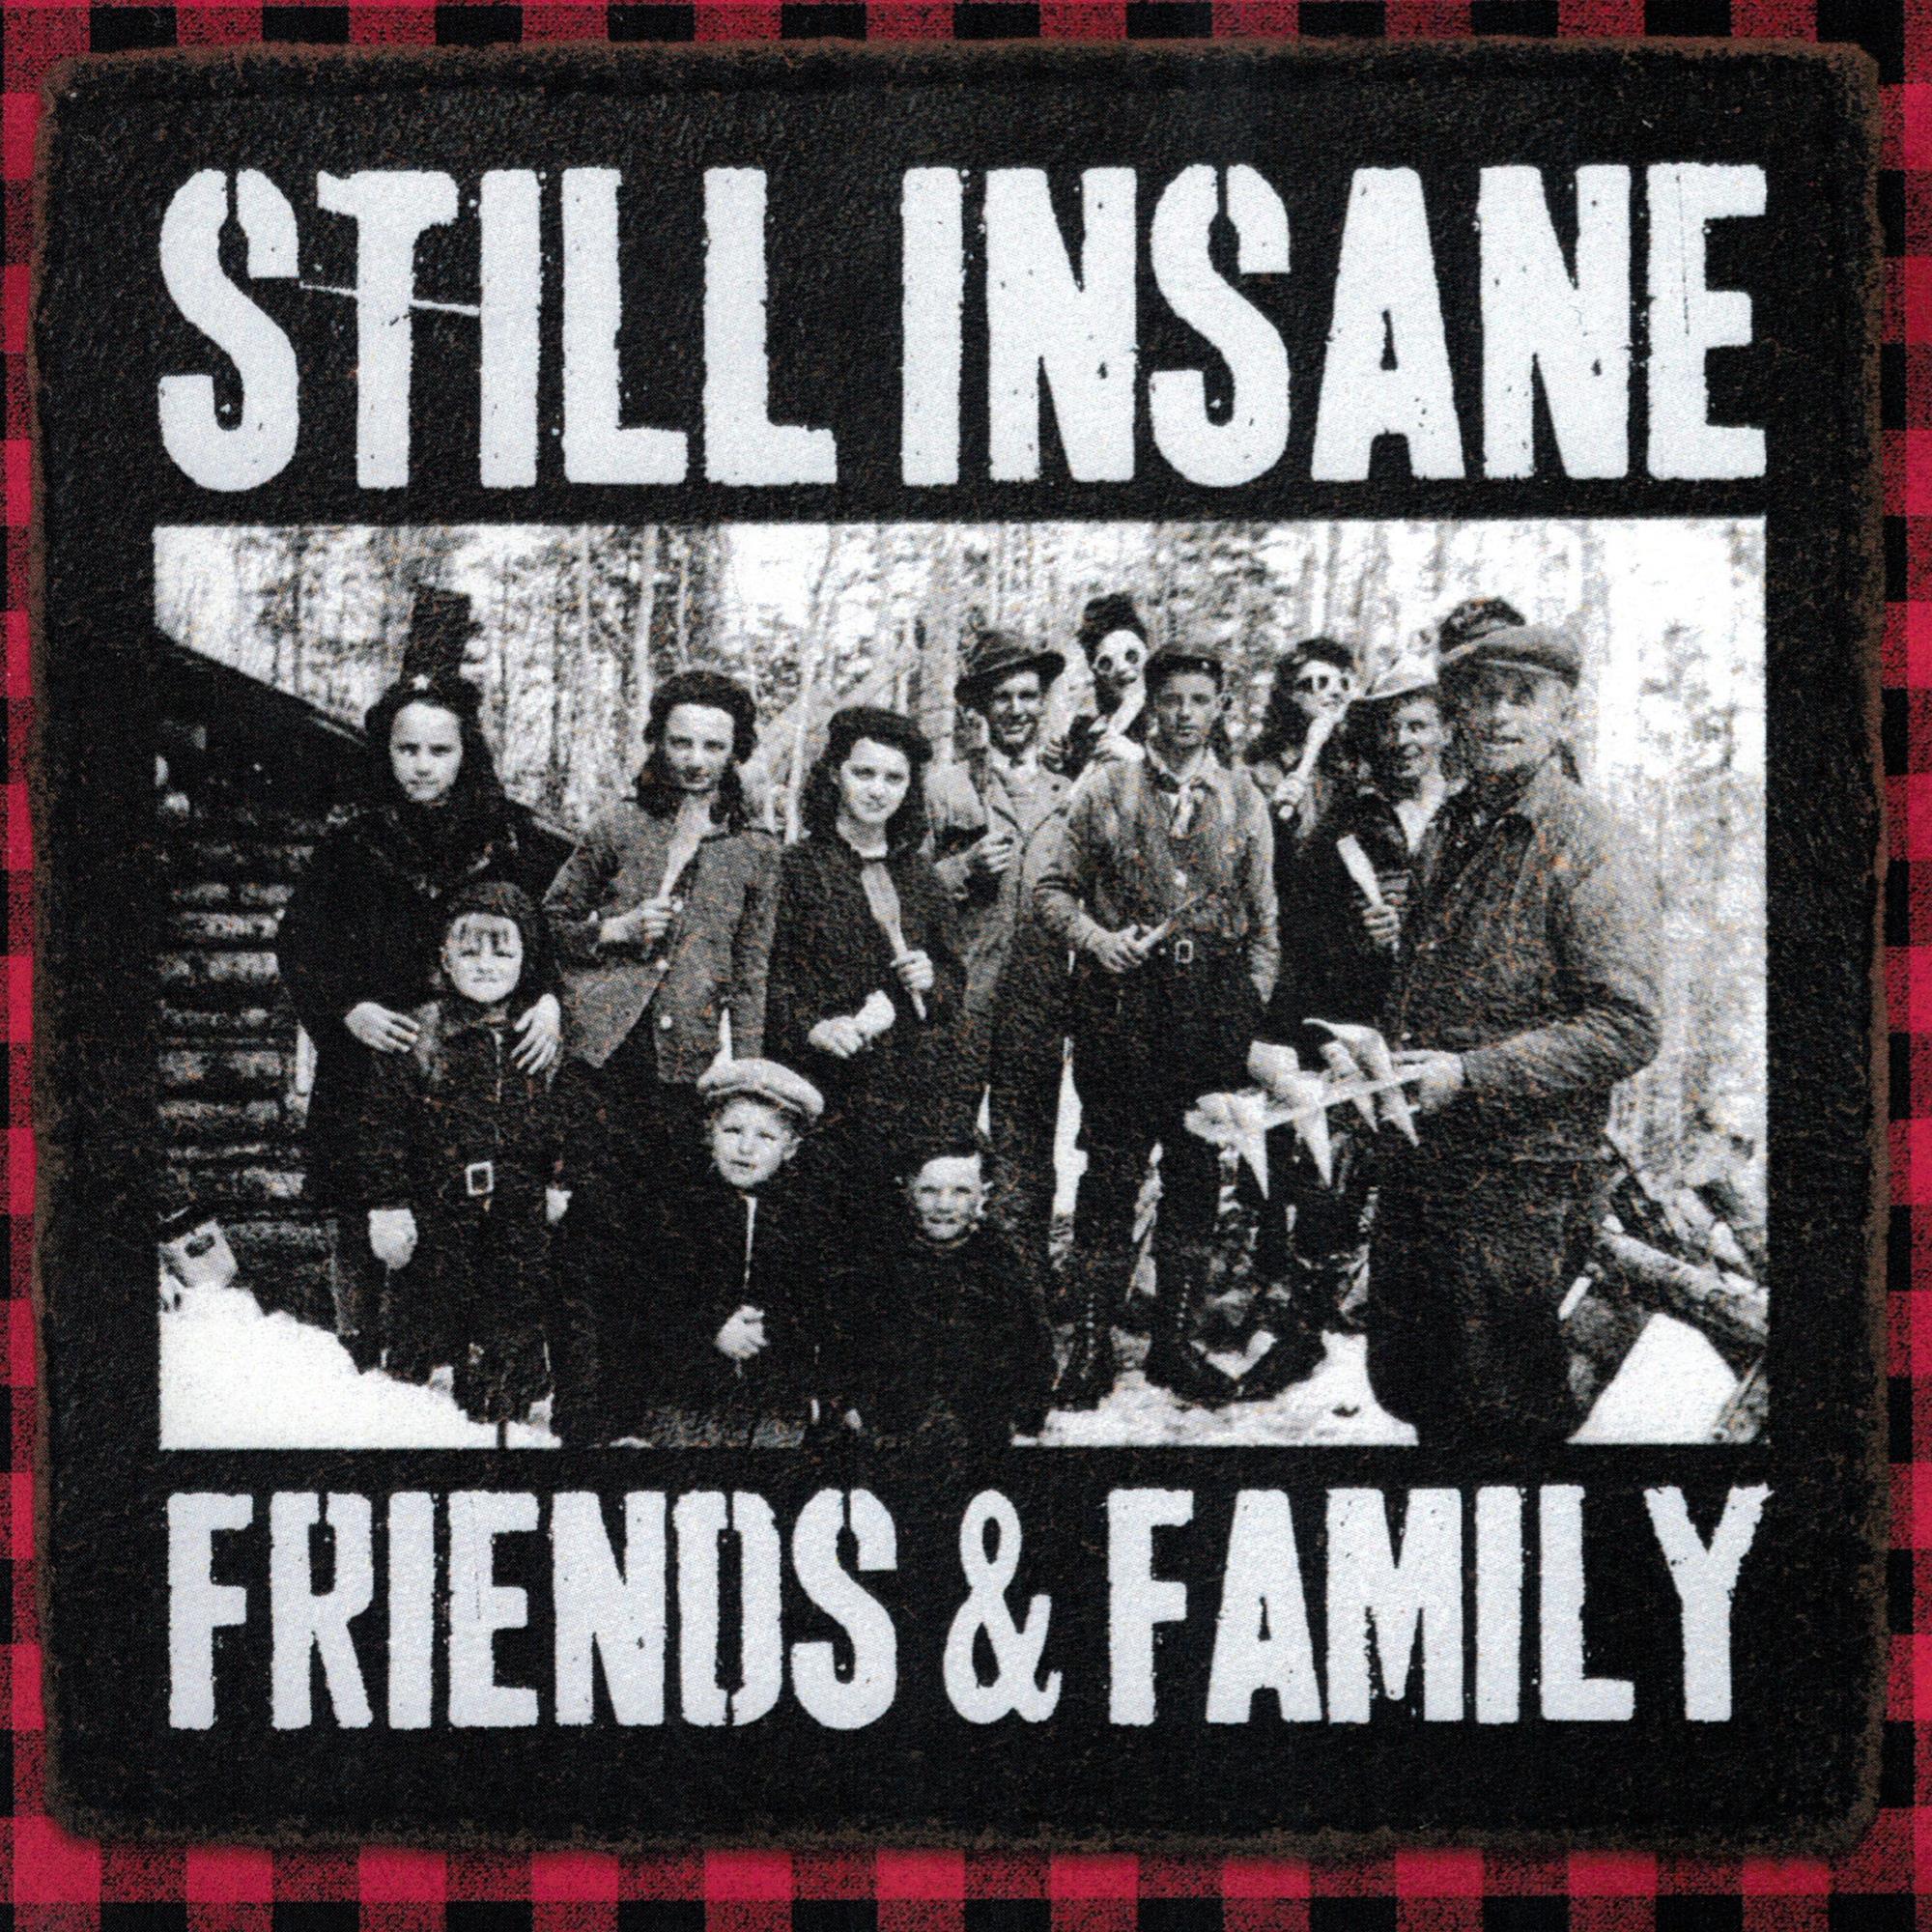 Friends & Family CD